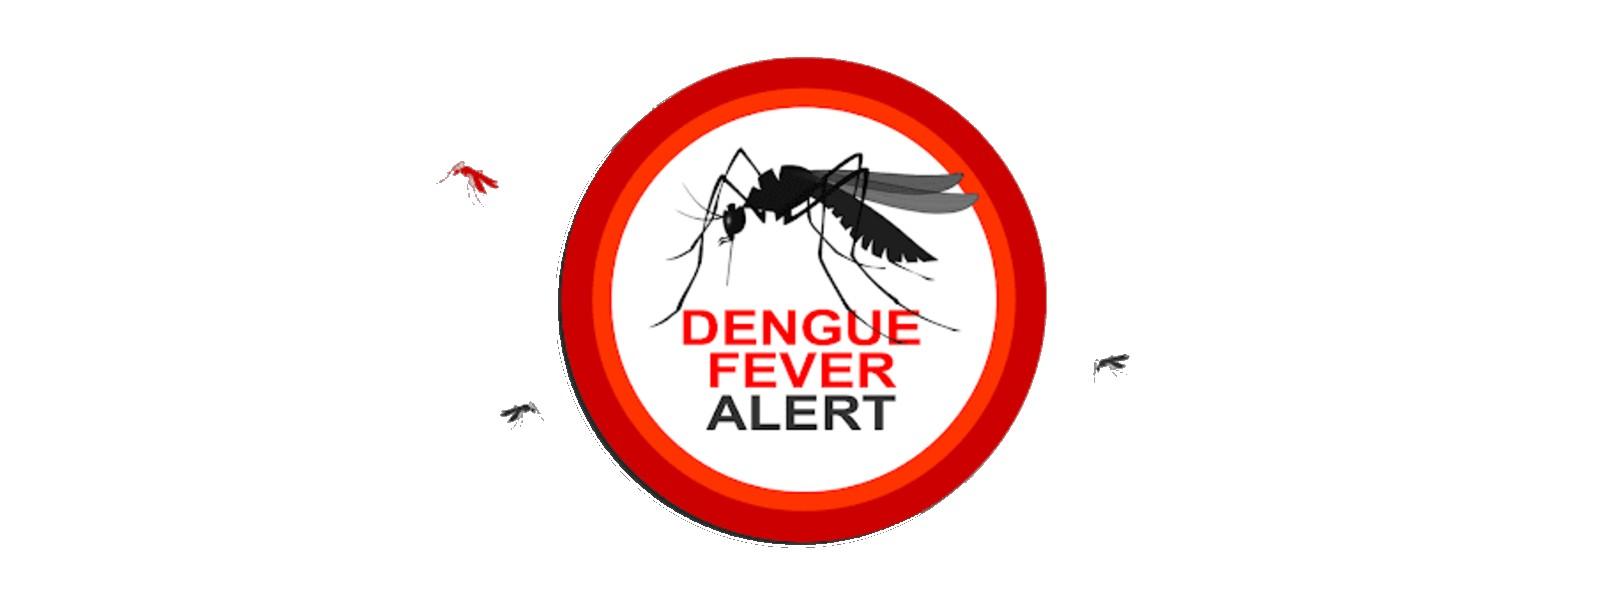 Sharp rise in dengue patients: NDCU